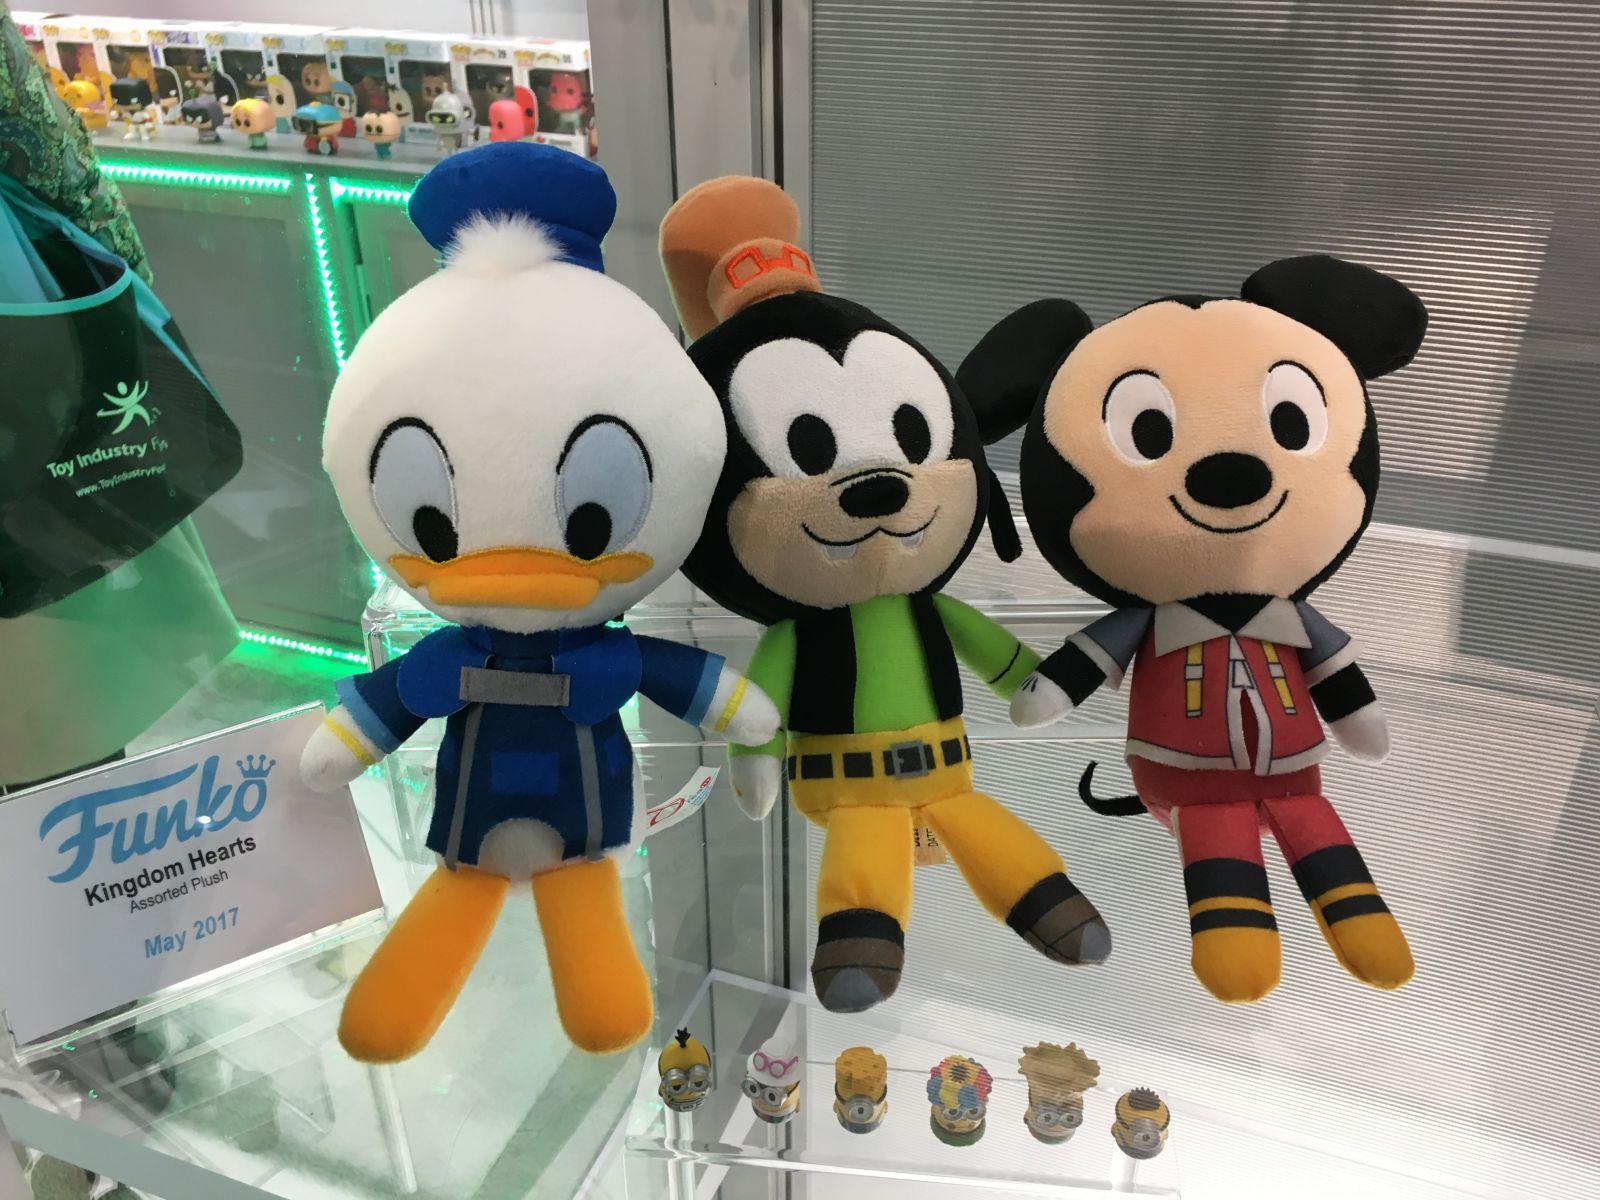 Kingdom Hearts Funko Pop Vinyl Figures Are Now Available For Pre Bott Riku Tf